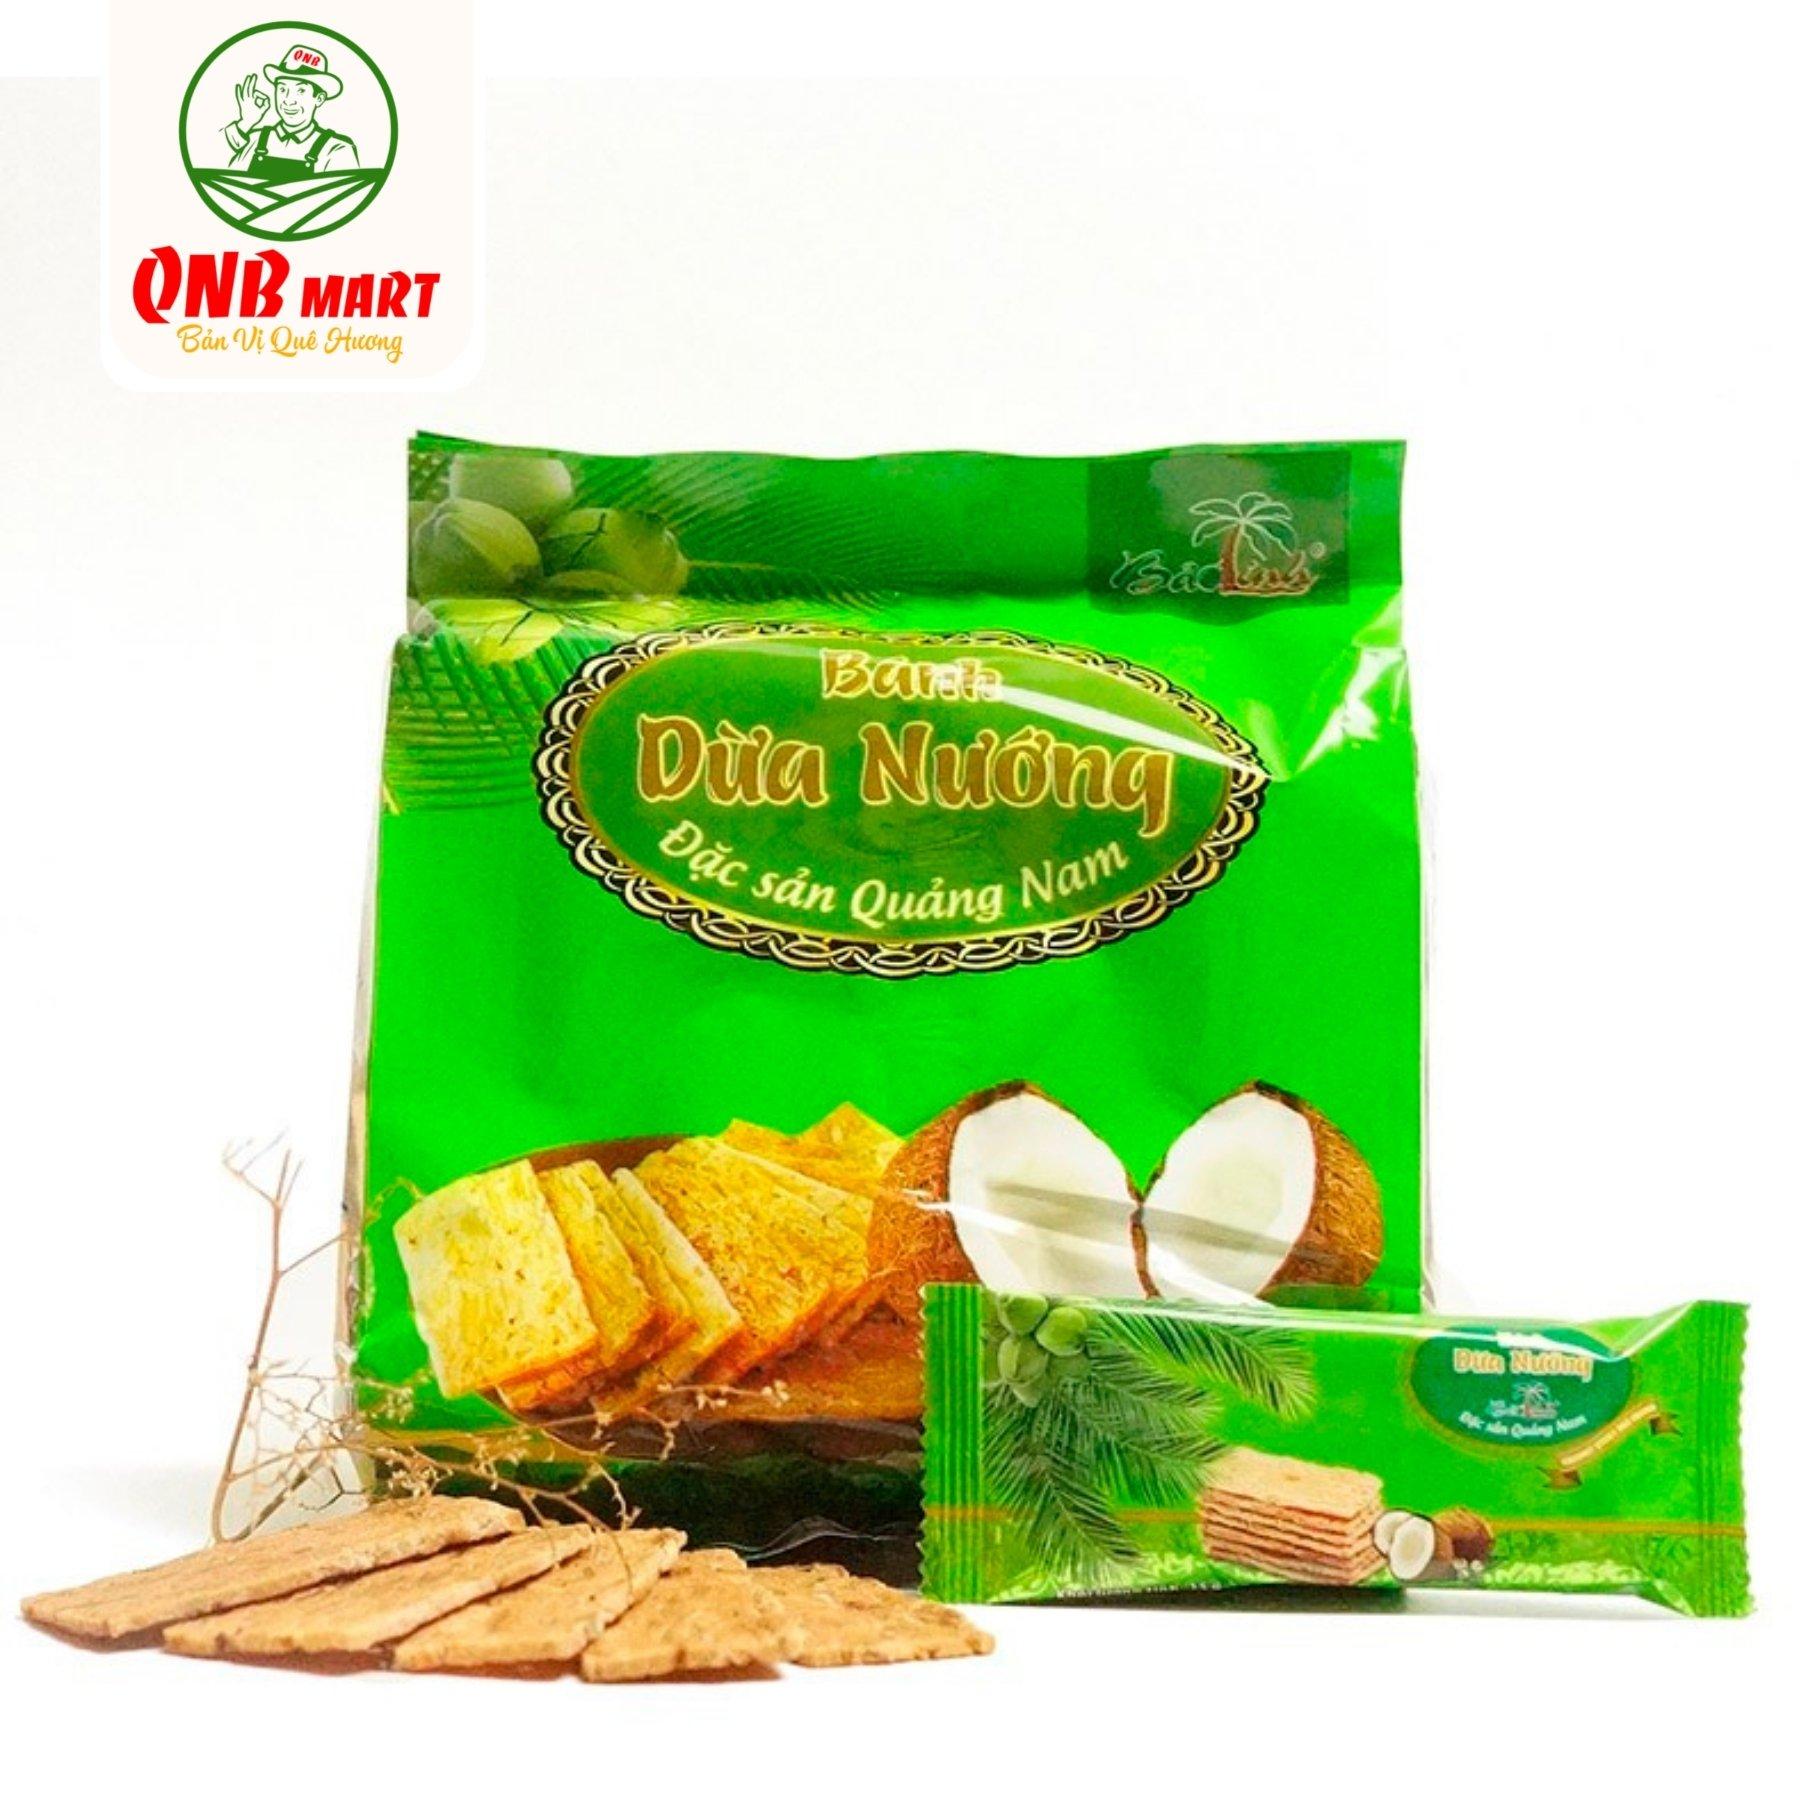 Bánh dừa Bảo Linh